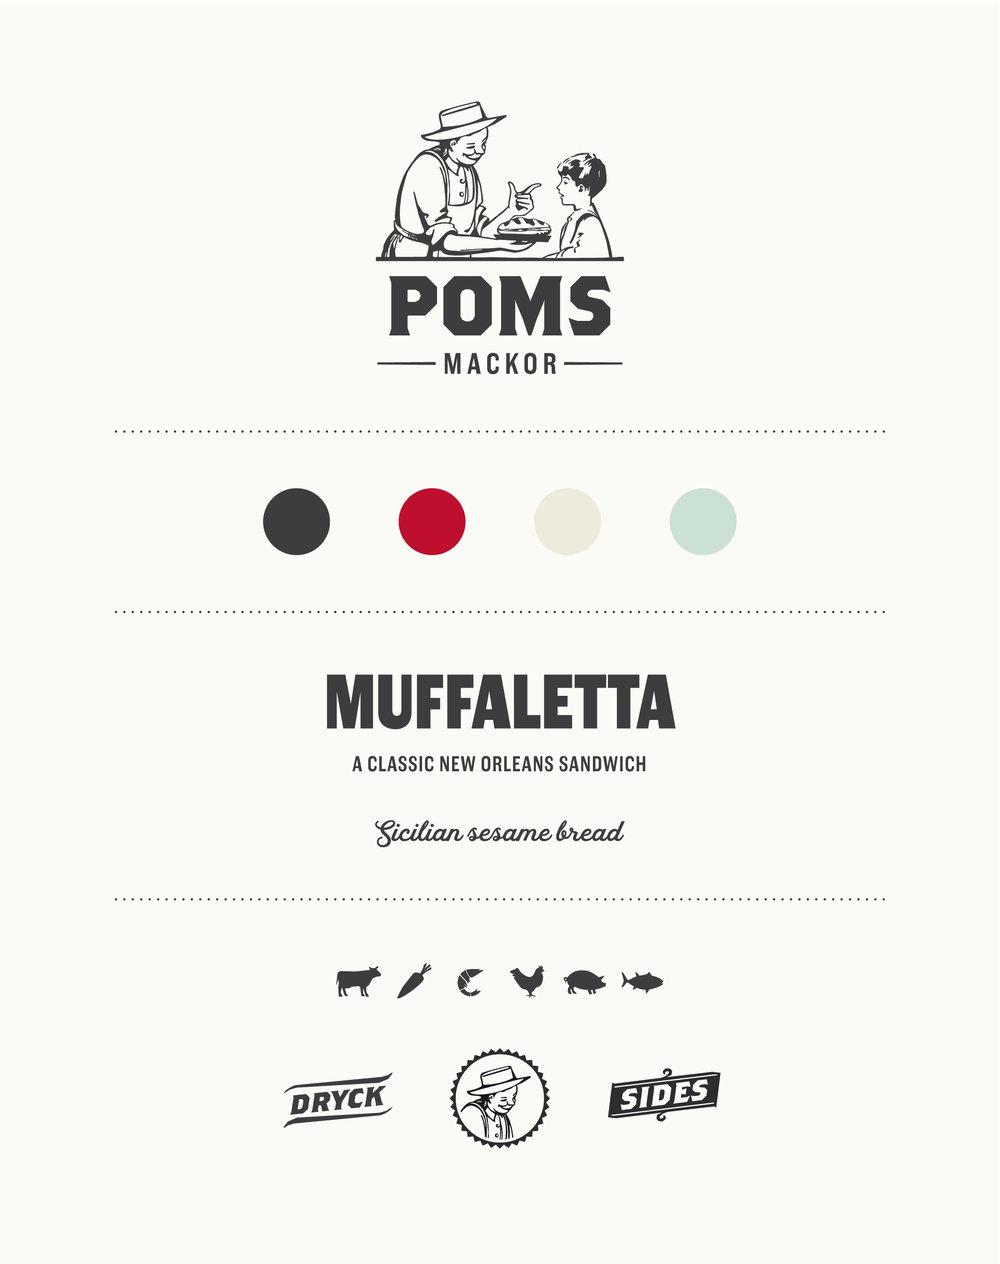 poms-mackor_sandwich_visual_identity.jpg